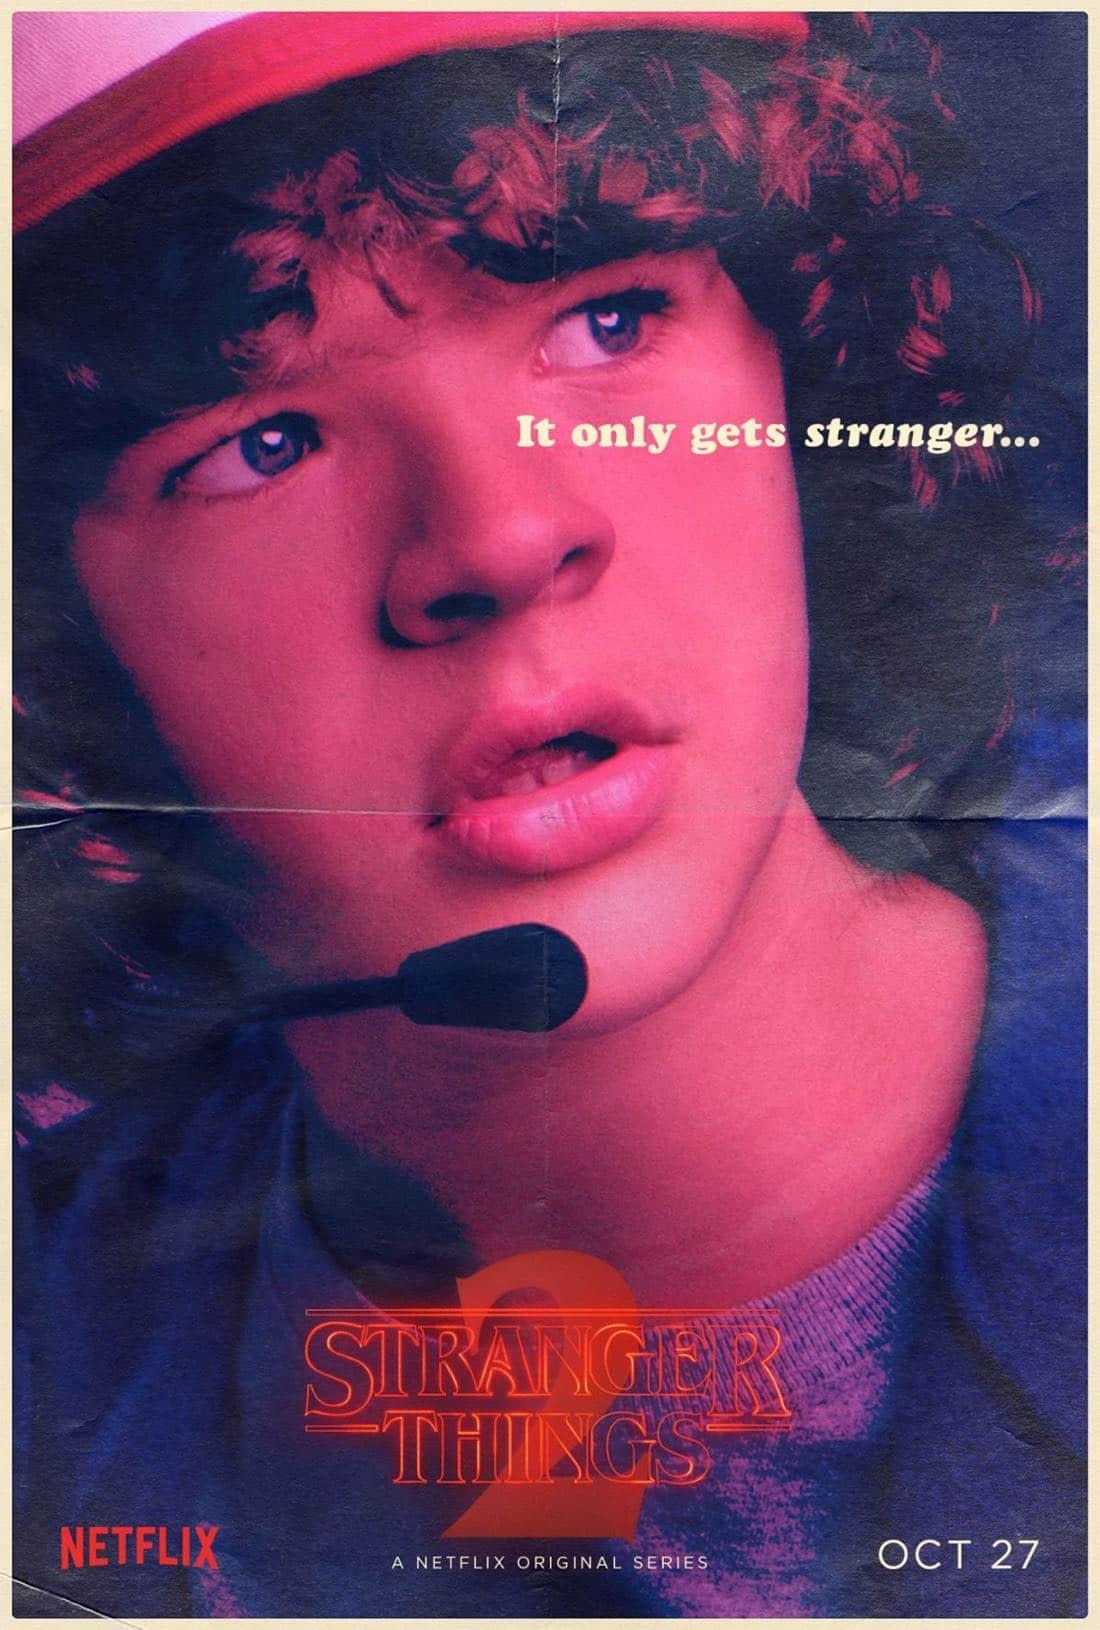 Stranger Things Character Poster - Gaten Matarazzo - Dustin